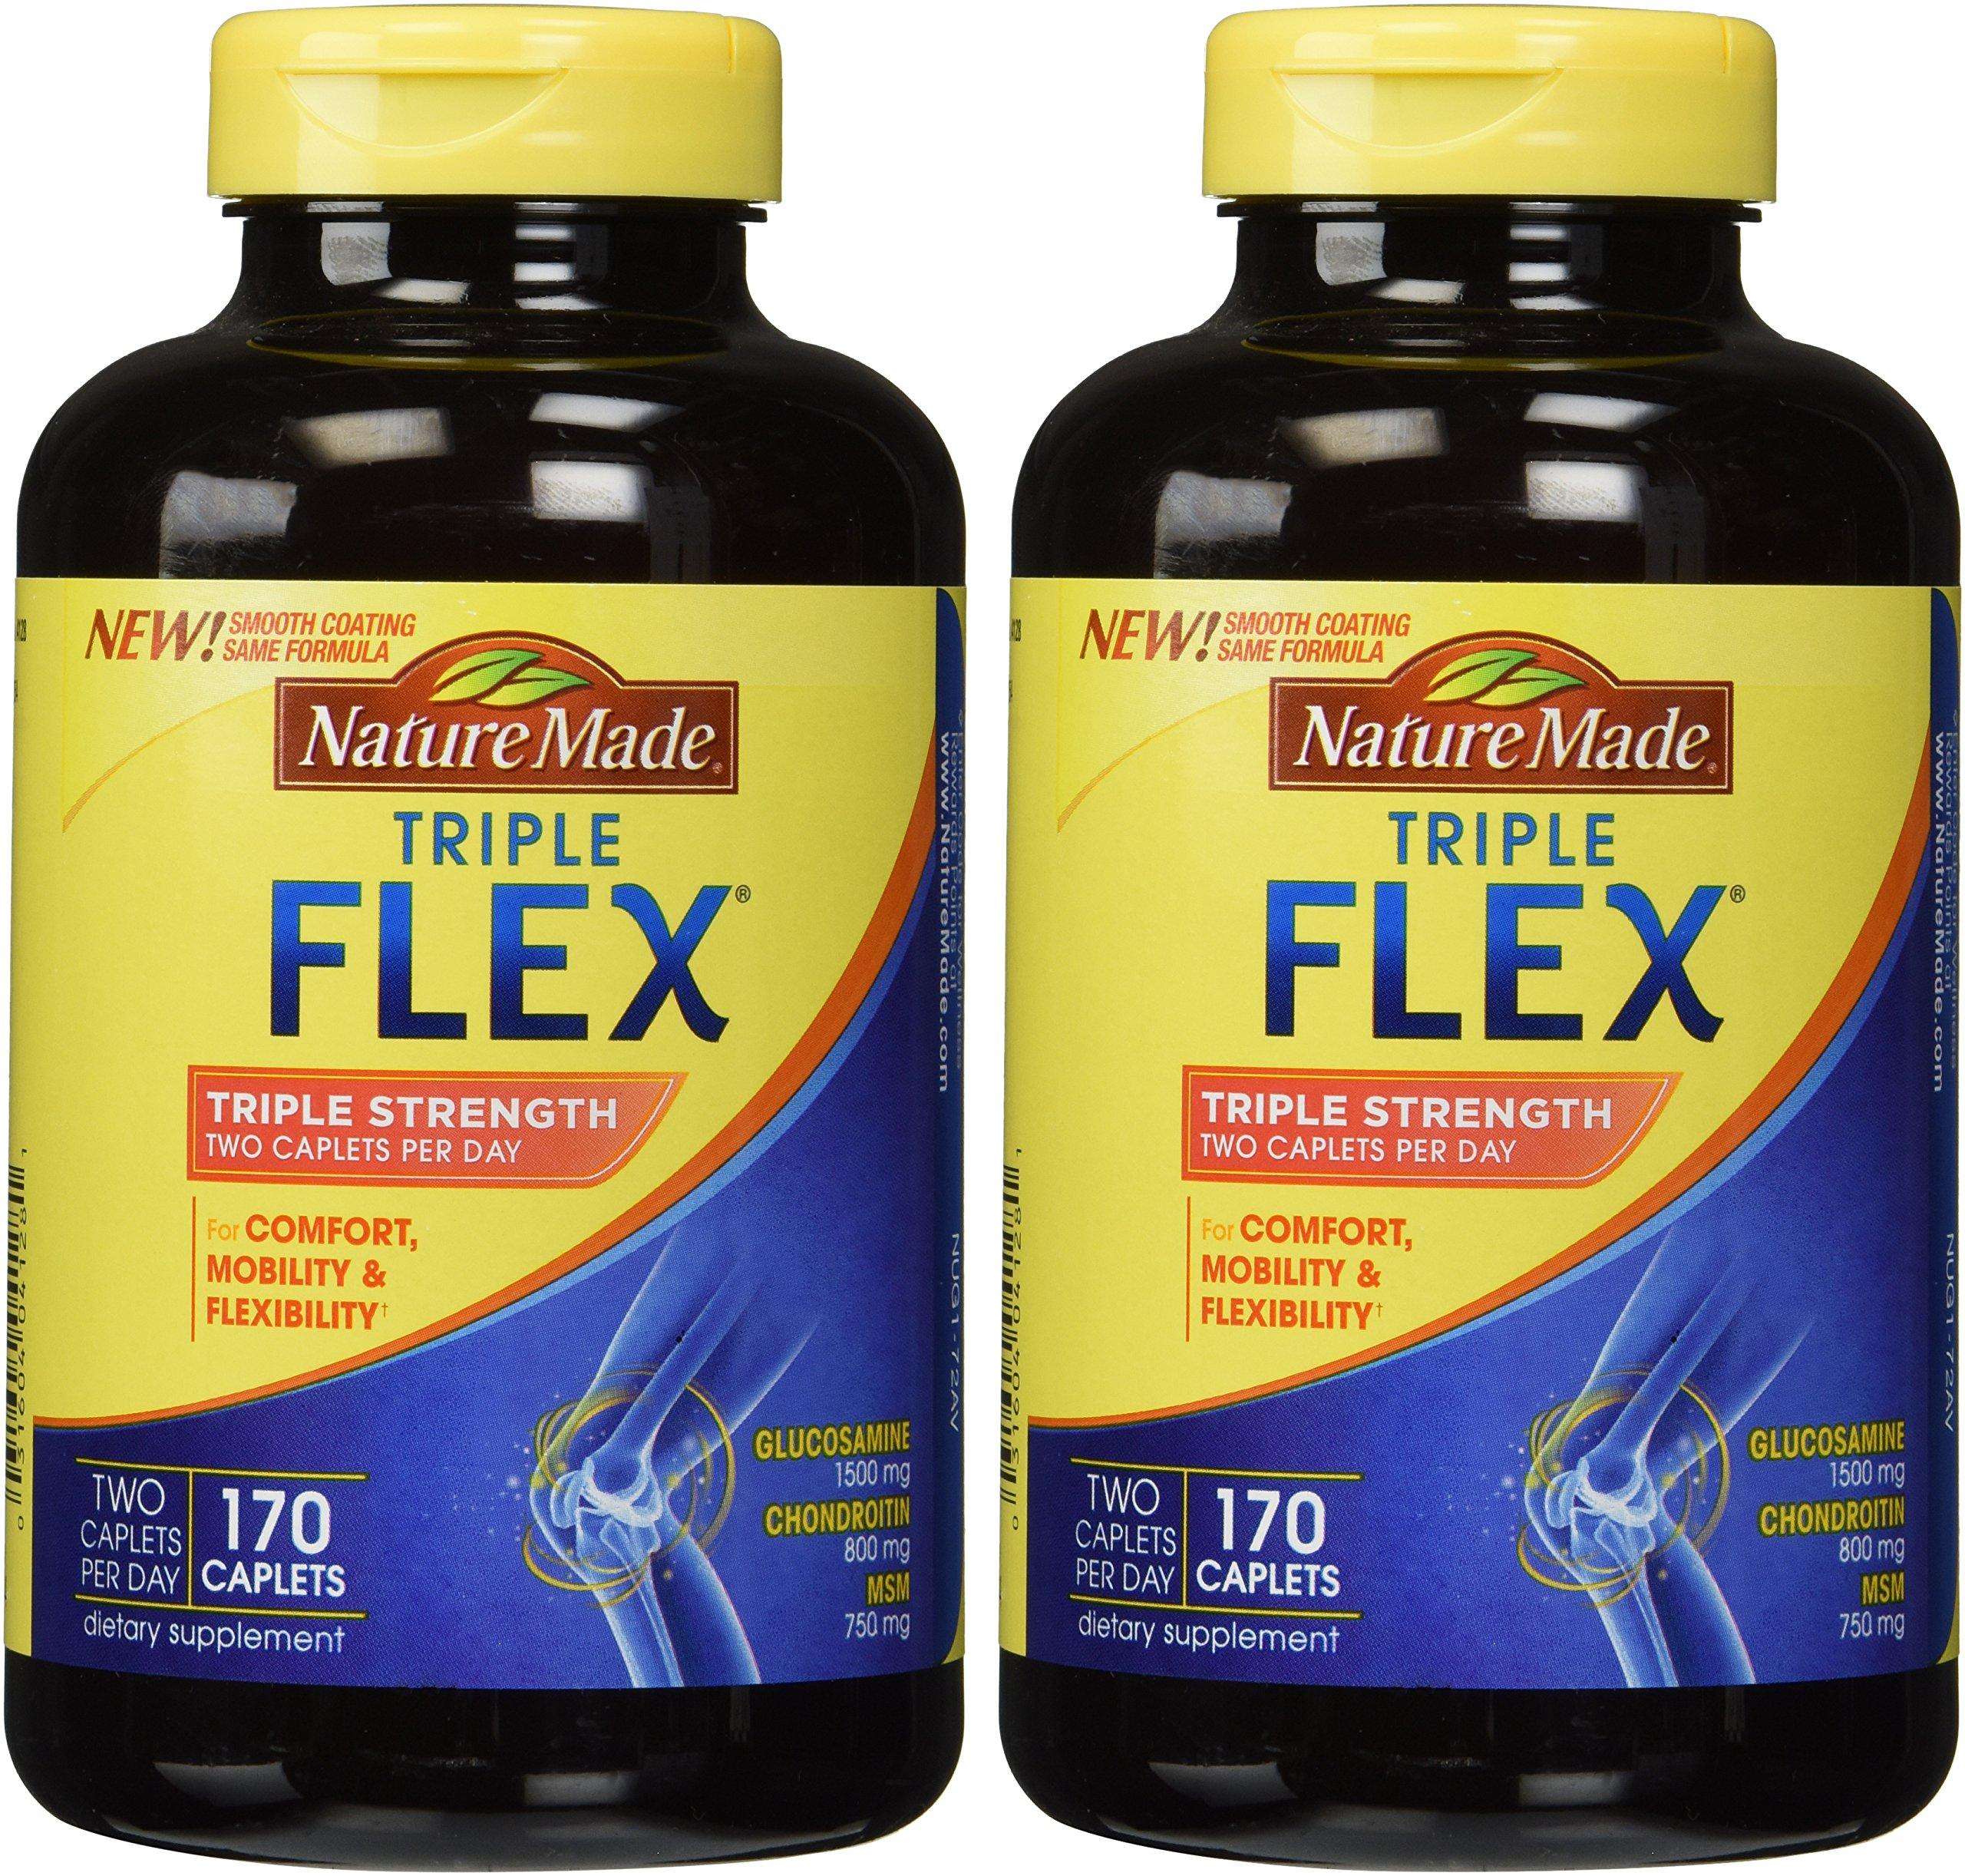 Nature Made TripleFlex - Glucosamine Chondroitin and MSM - 2 Bottles, 170 Caplets Each